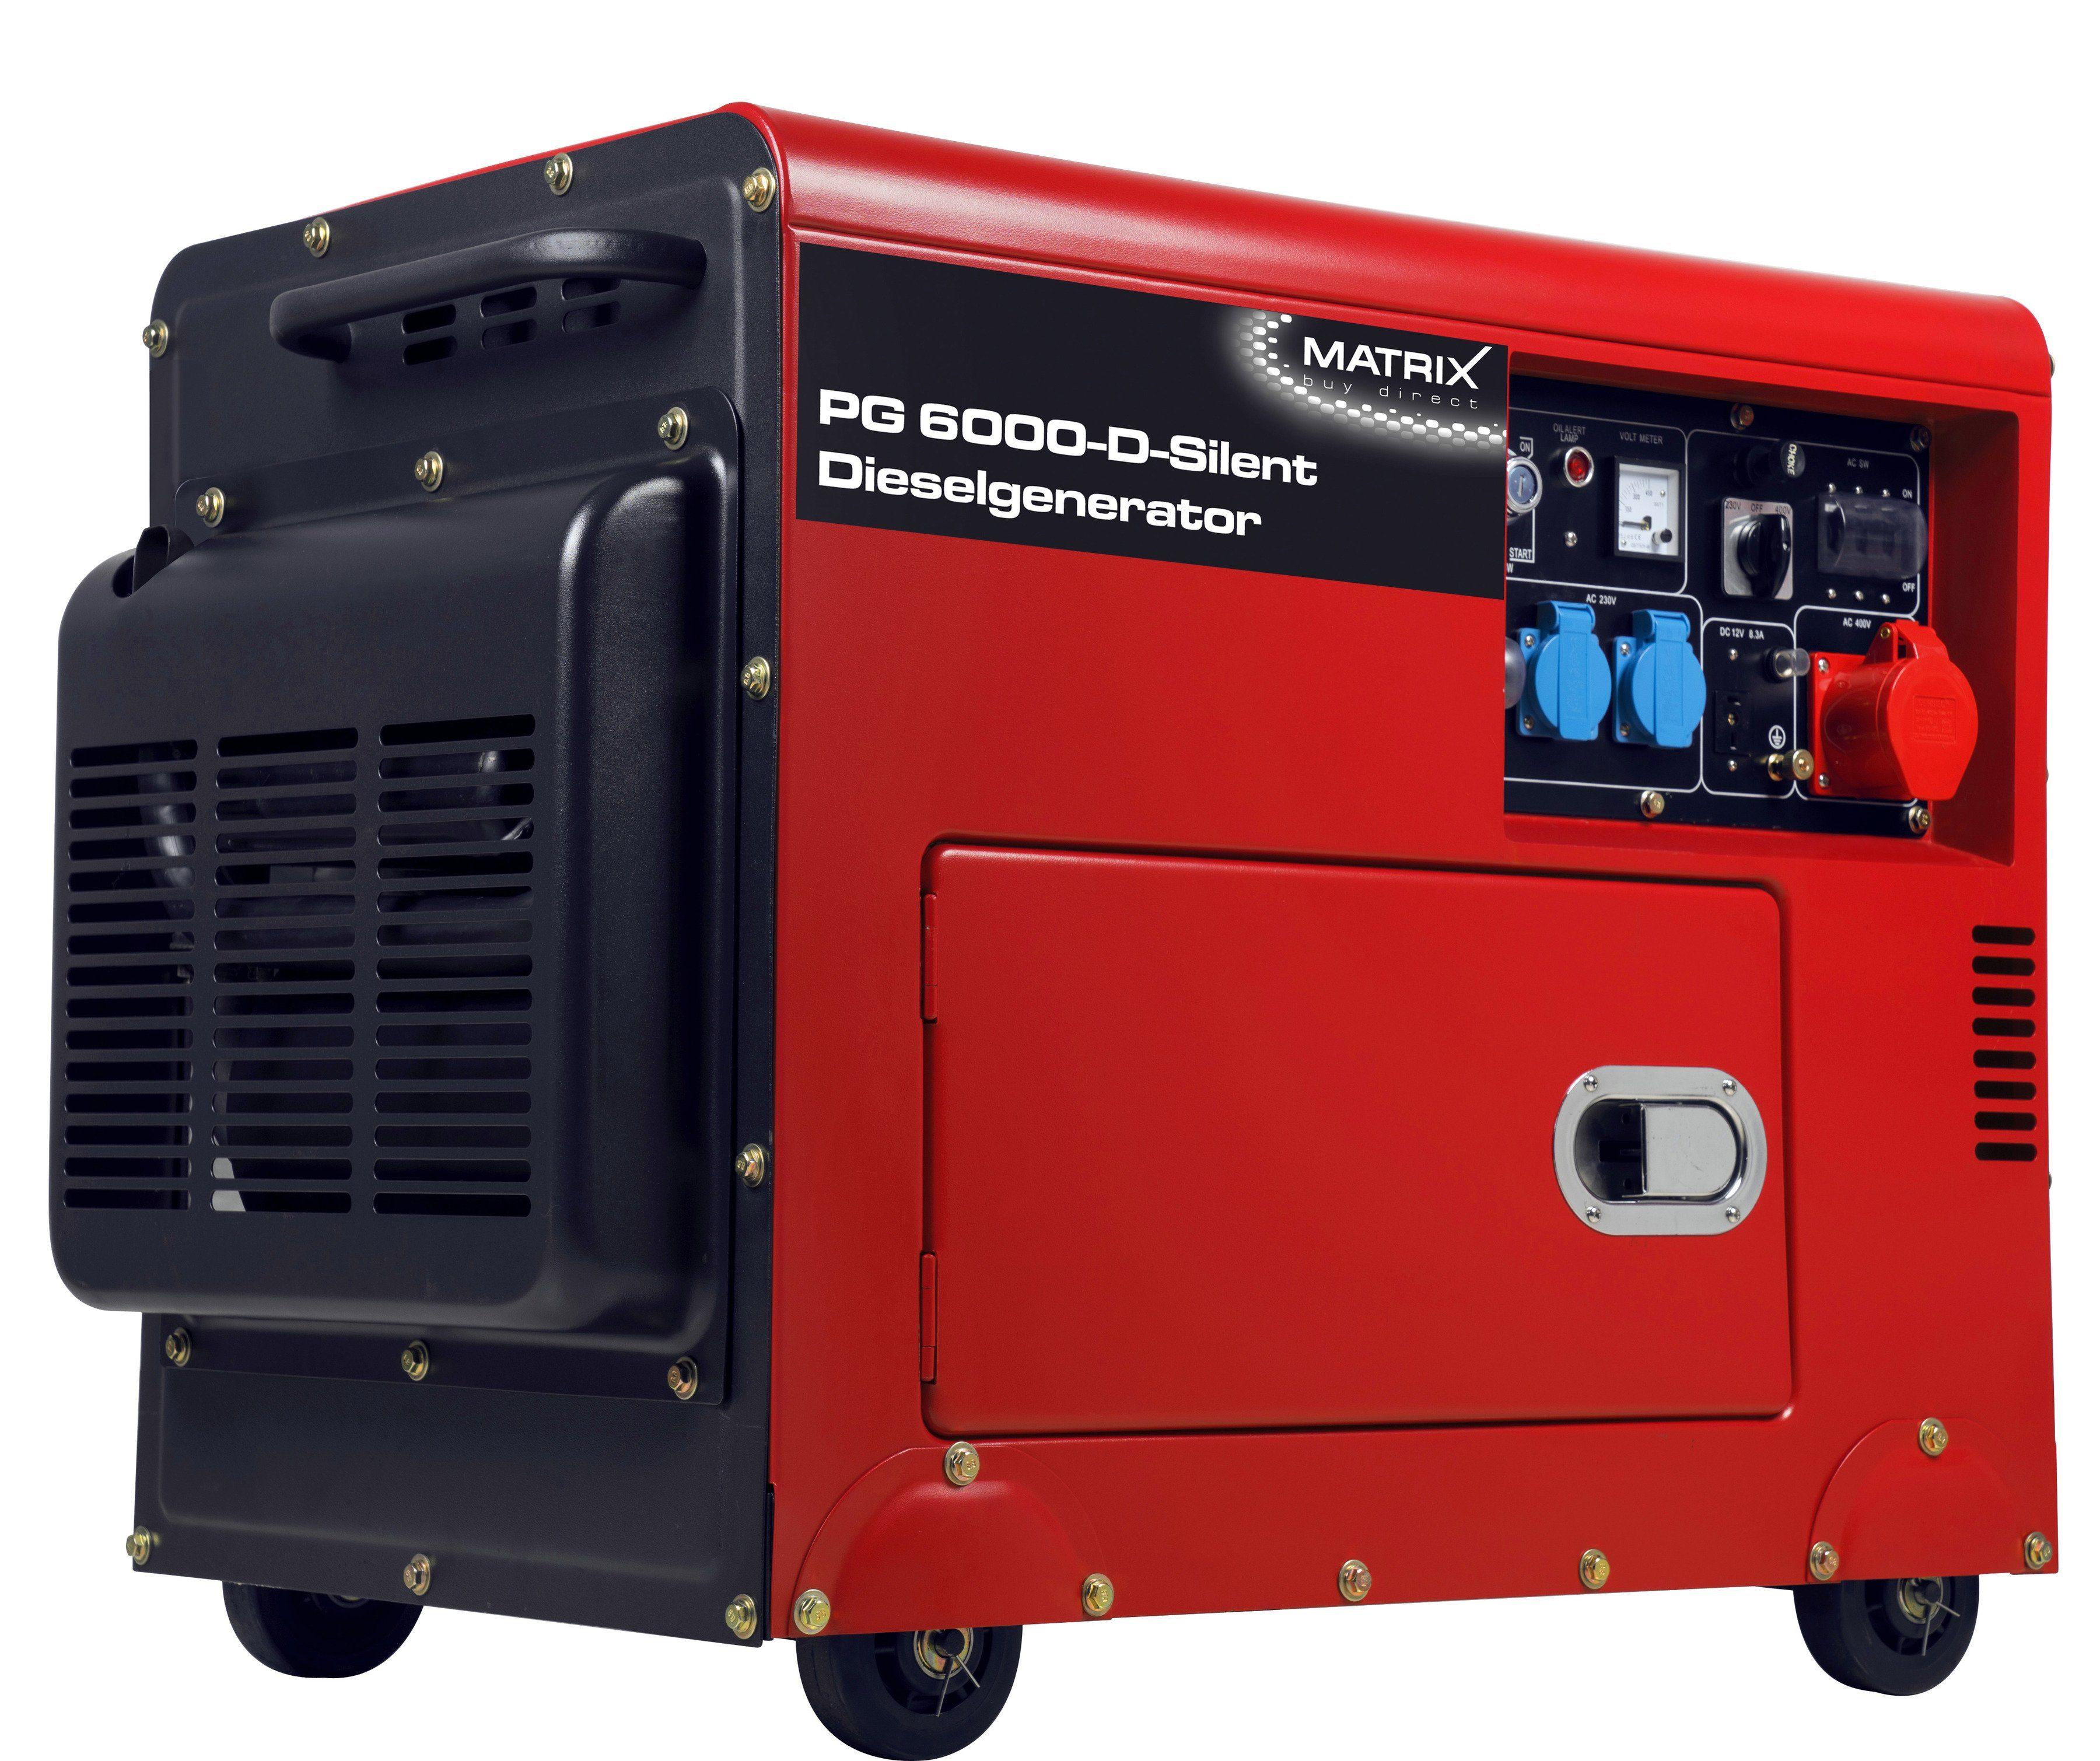 Matrix Stromerzeuger »PG 6000 D«